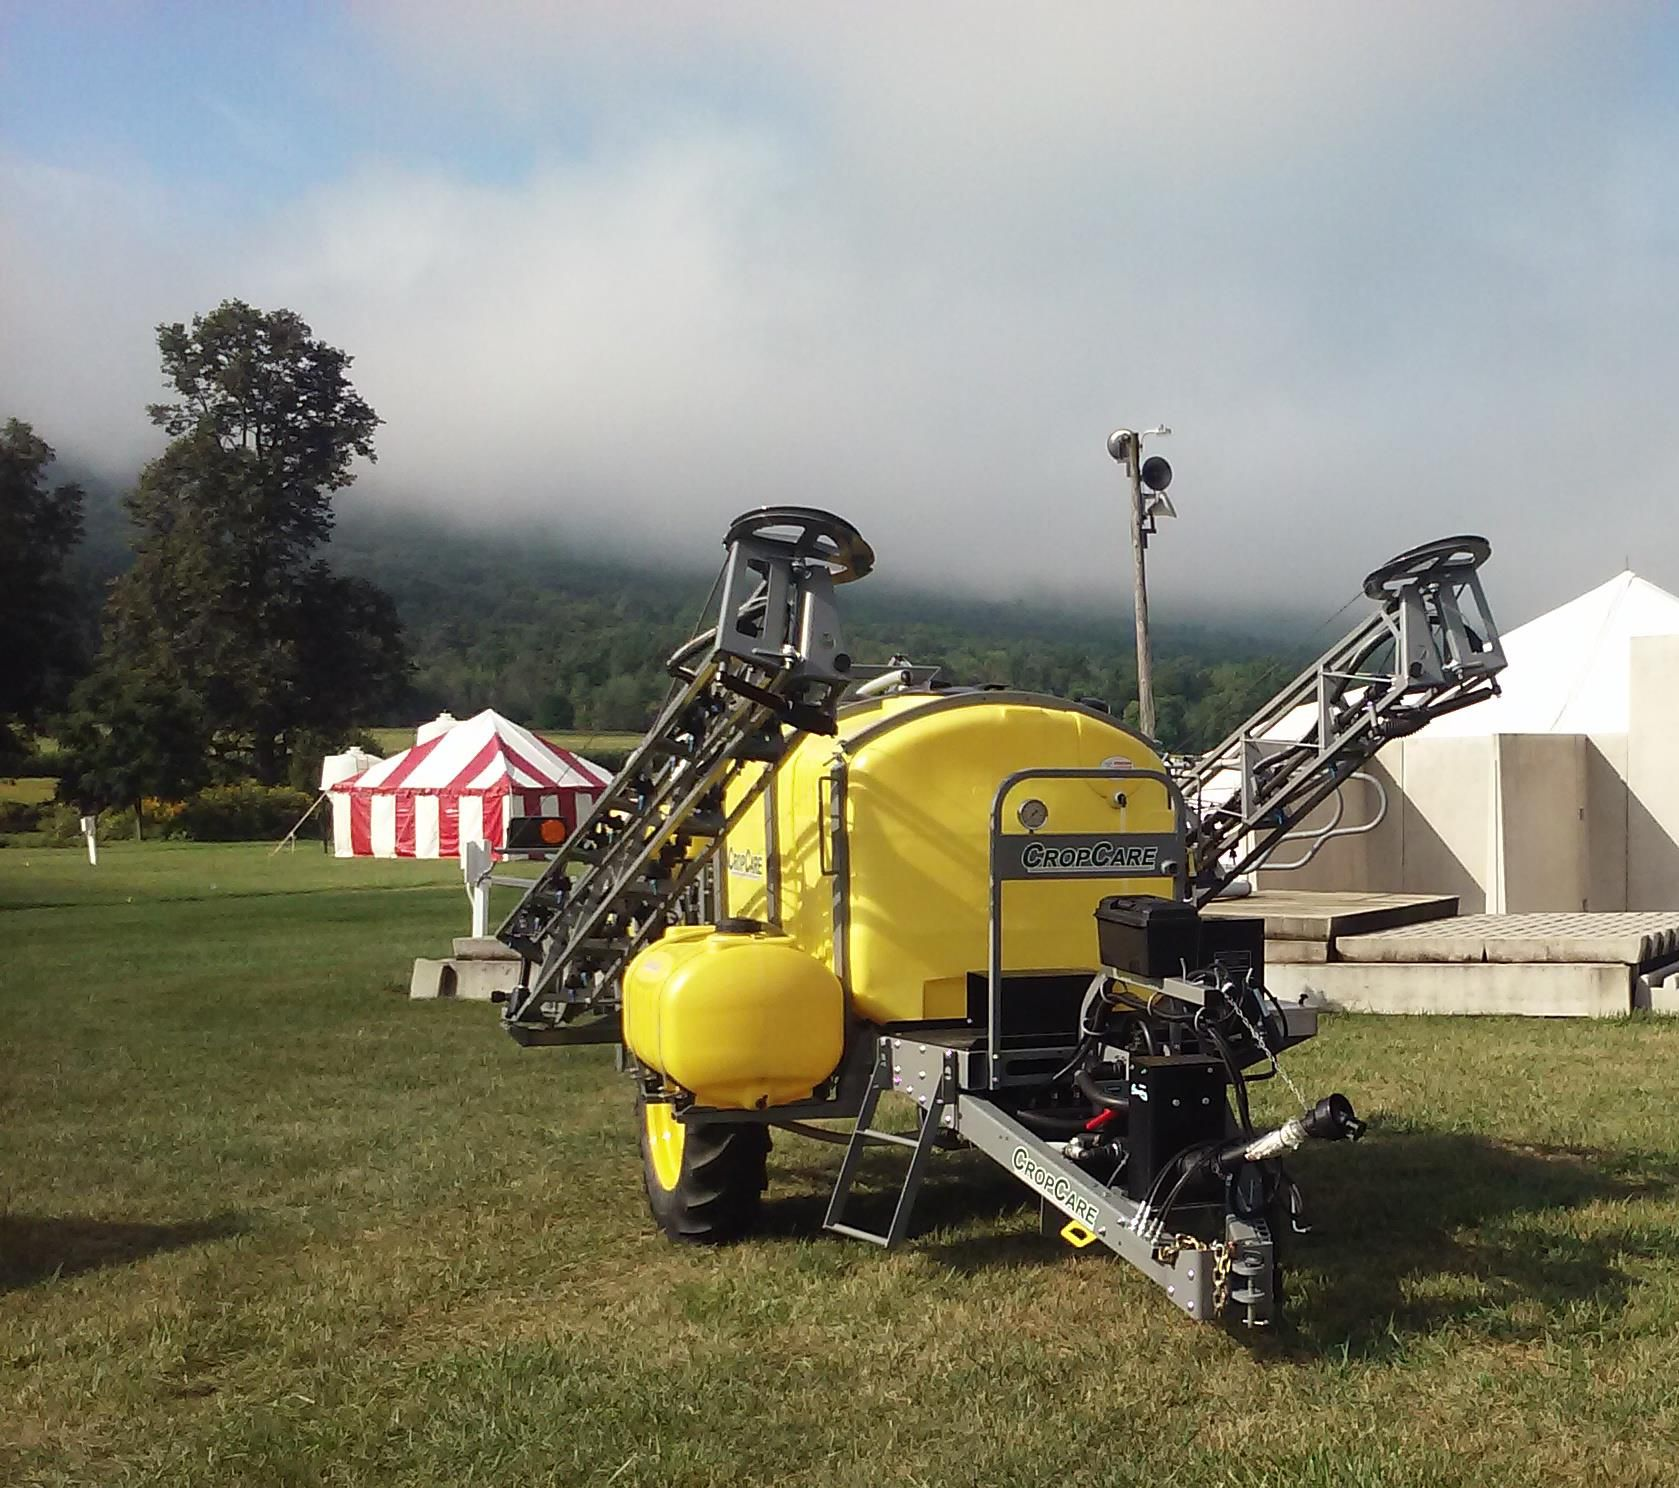 Cropcare 750 Gallon Trailer Sprayer W 60 Air Ride Hydraulic Front Fold Boom Air Ride Sprayers Farm Equipment